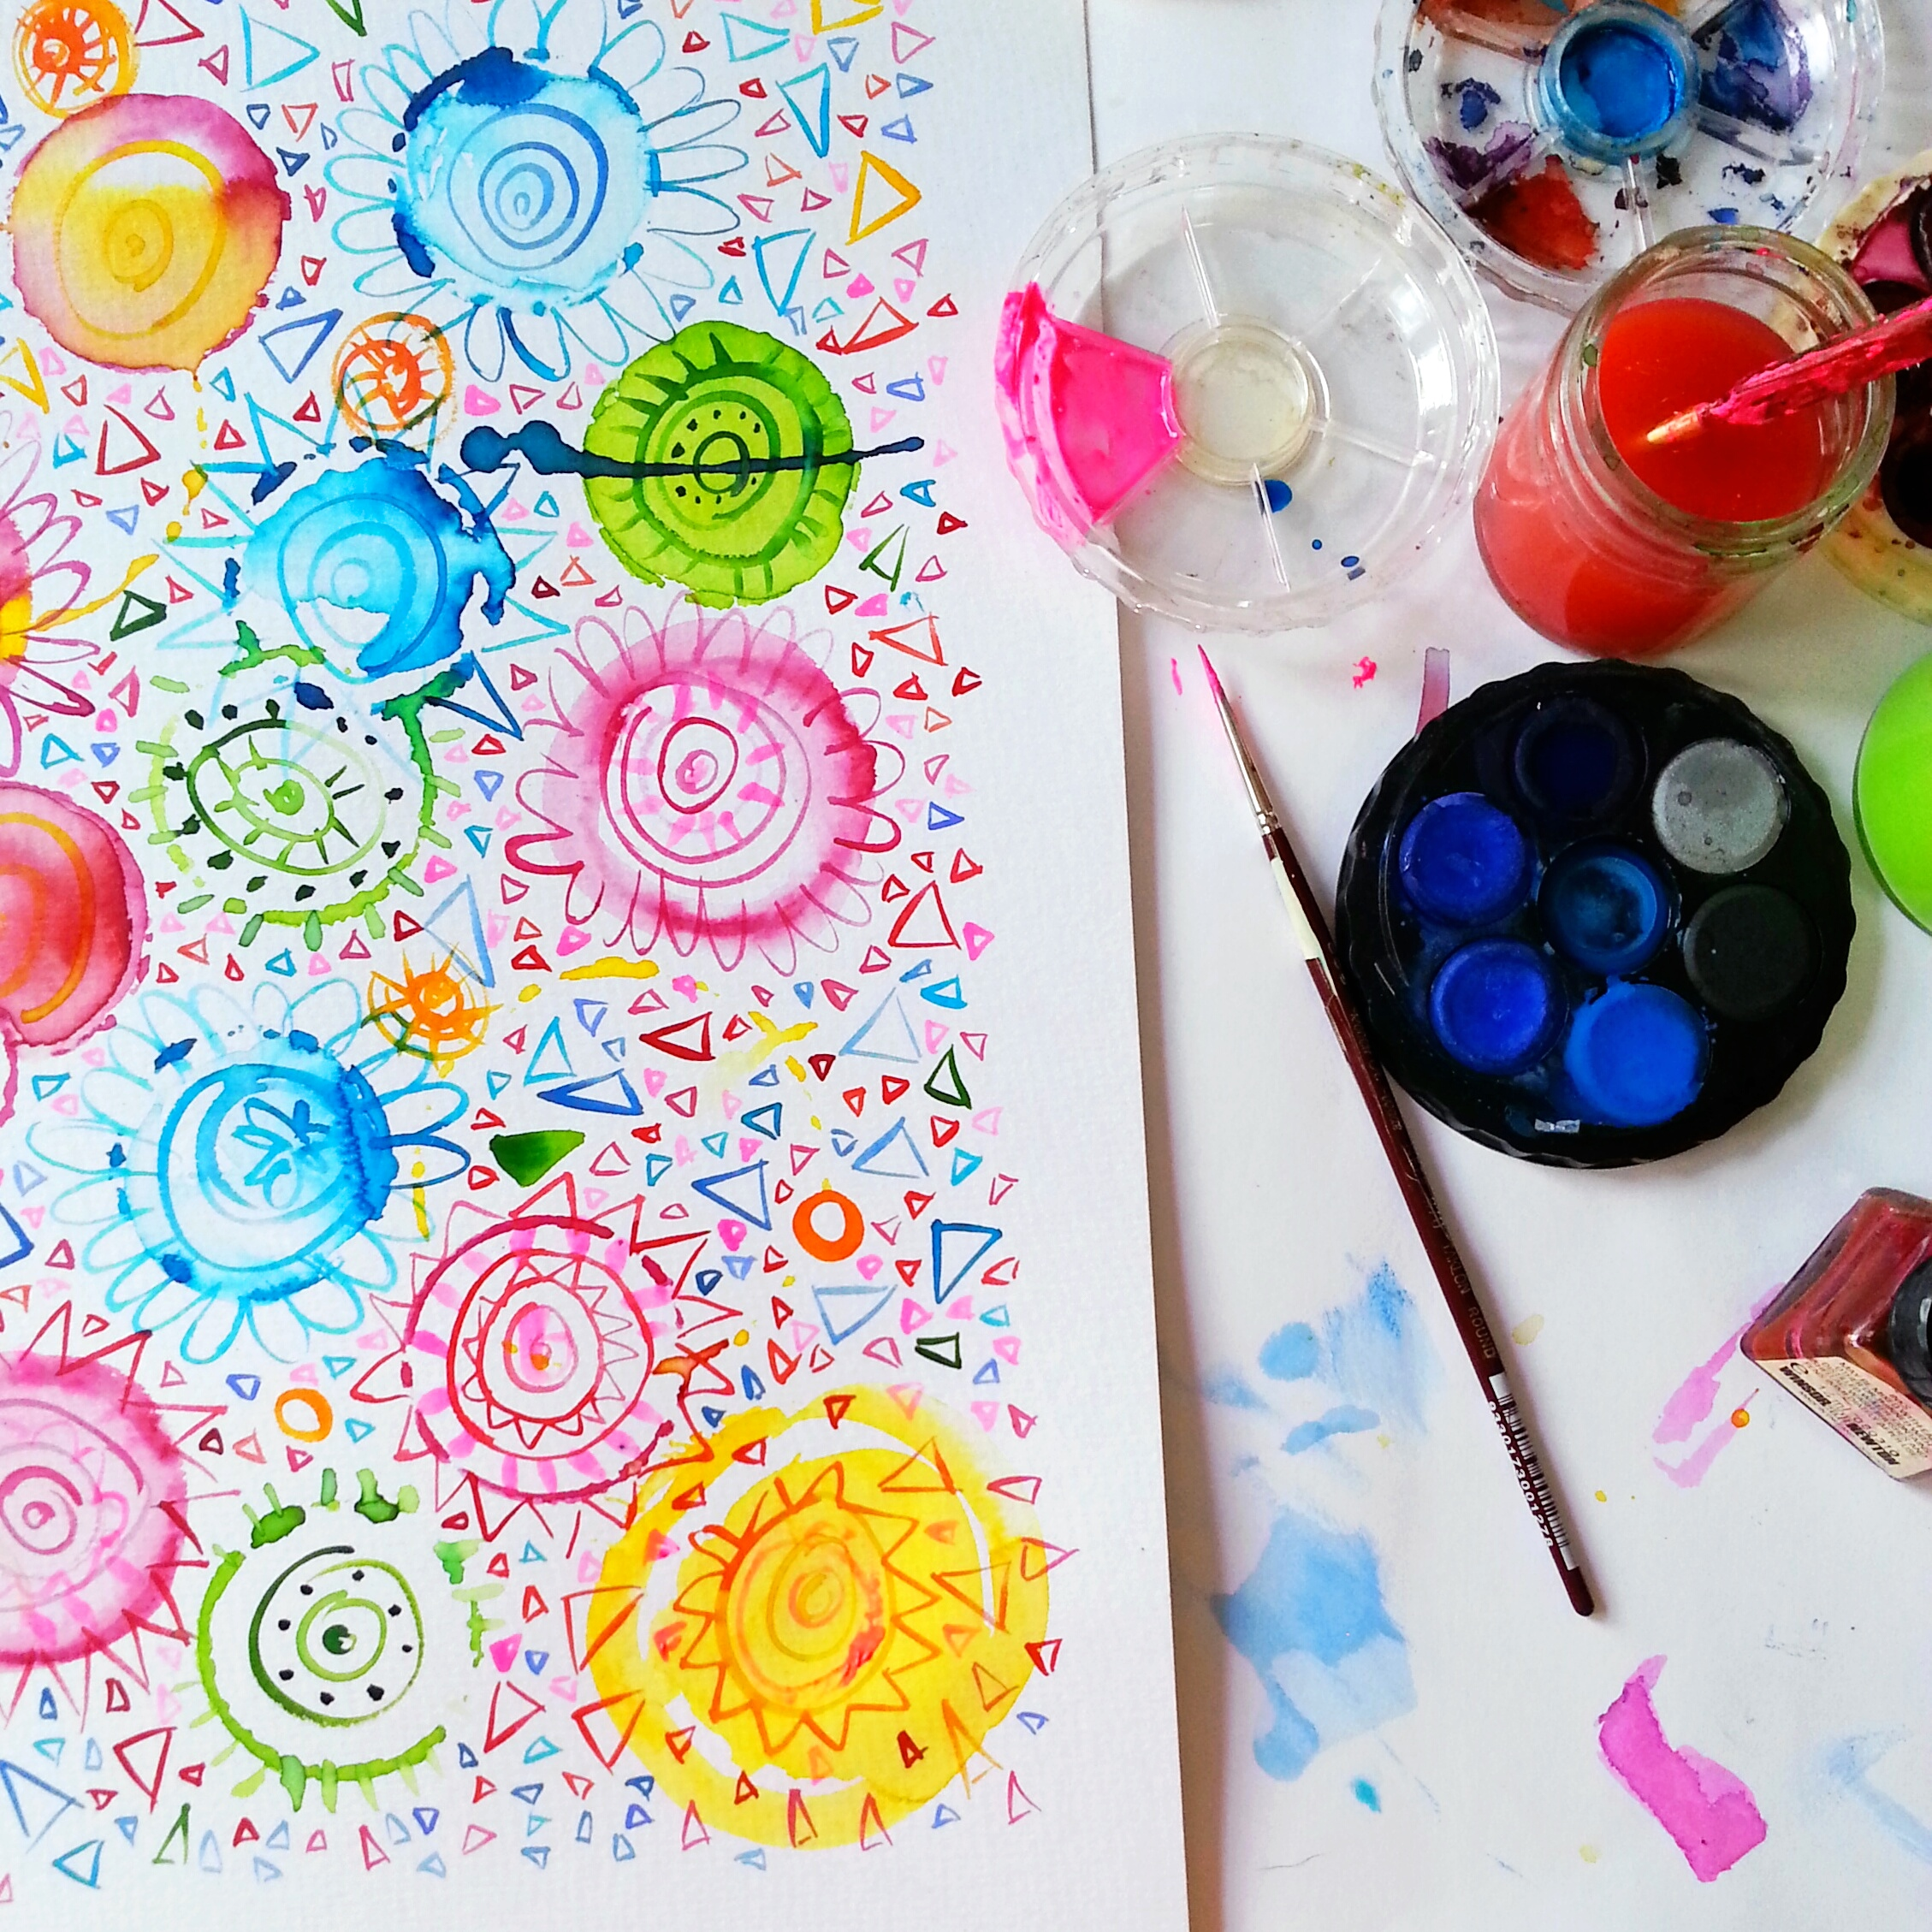 Watercolour workshop with Shani Nottingham - The Corner Store Gallery, Orange NSW